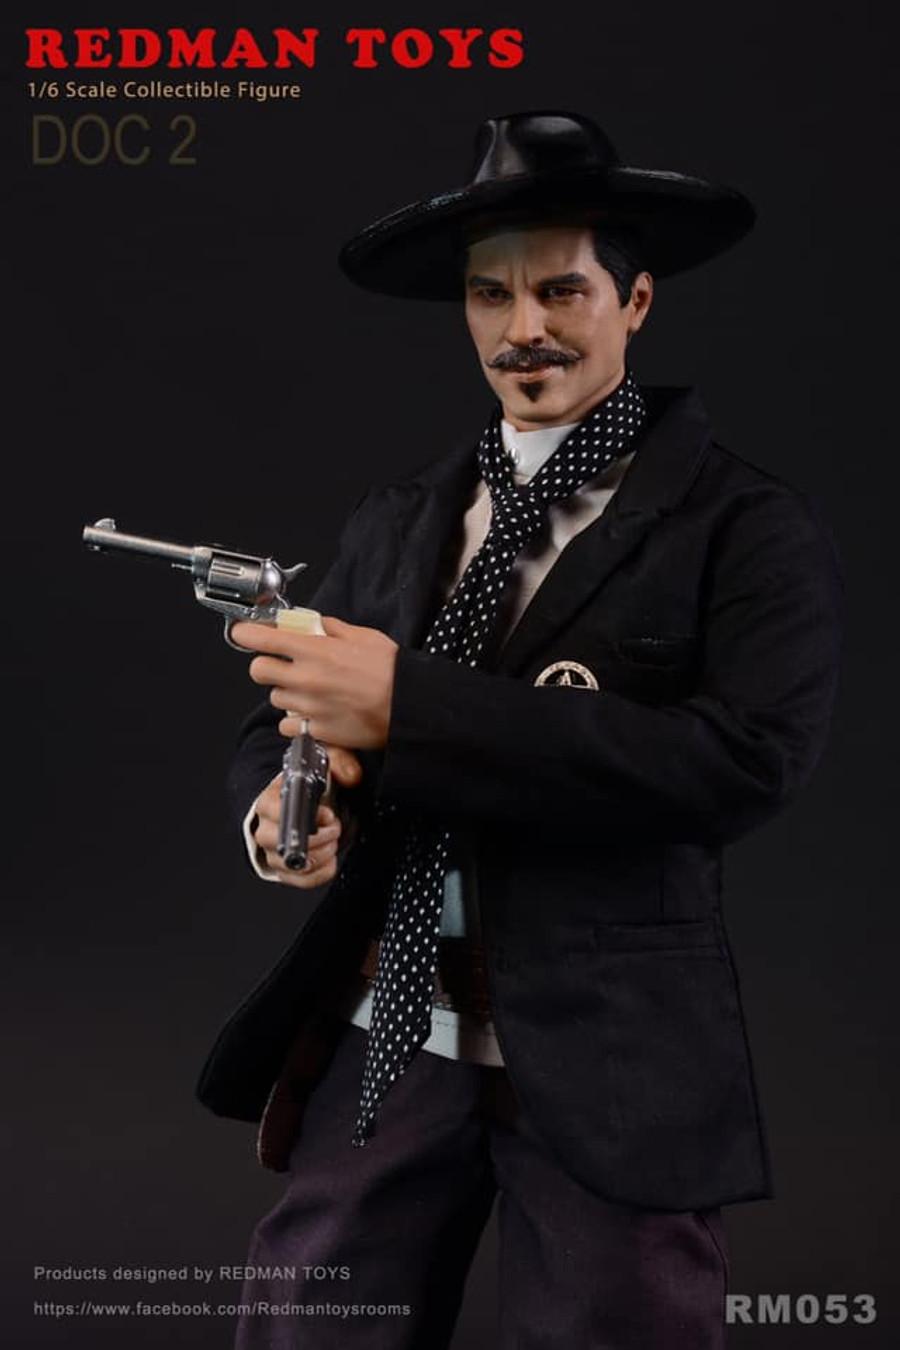 Redman Toys - The Cowboy Doc 2